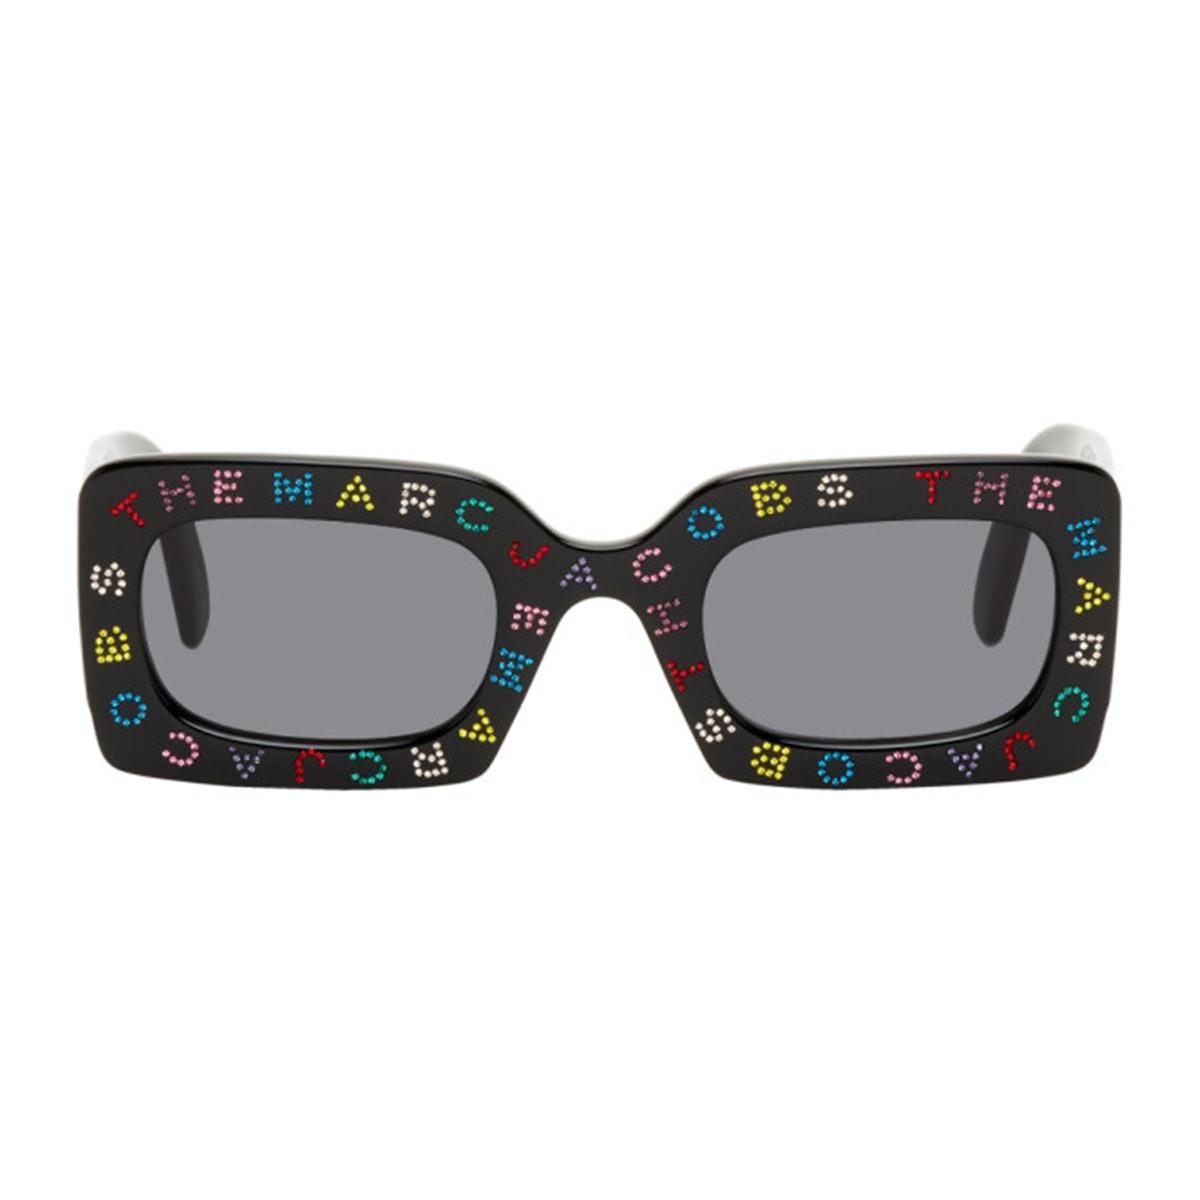 Marc Jacobs Black 'The Logo' Rectangular Sunglasses